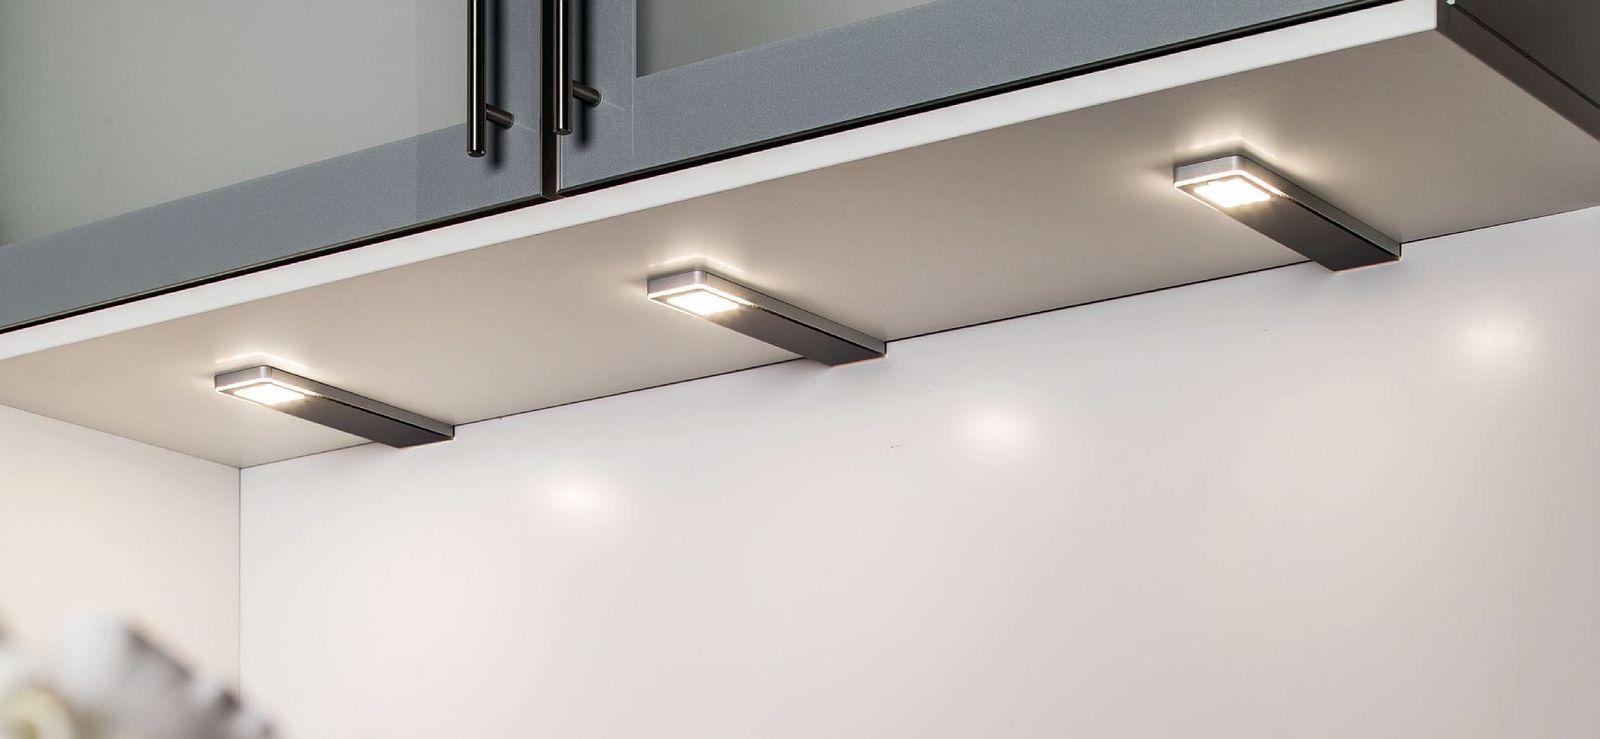 4-er Set LED Unterbauleuchte dimmbar Küche 4 x 5 W Konverter Sensor ...